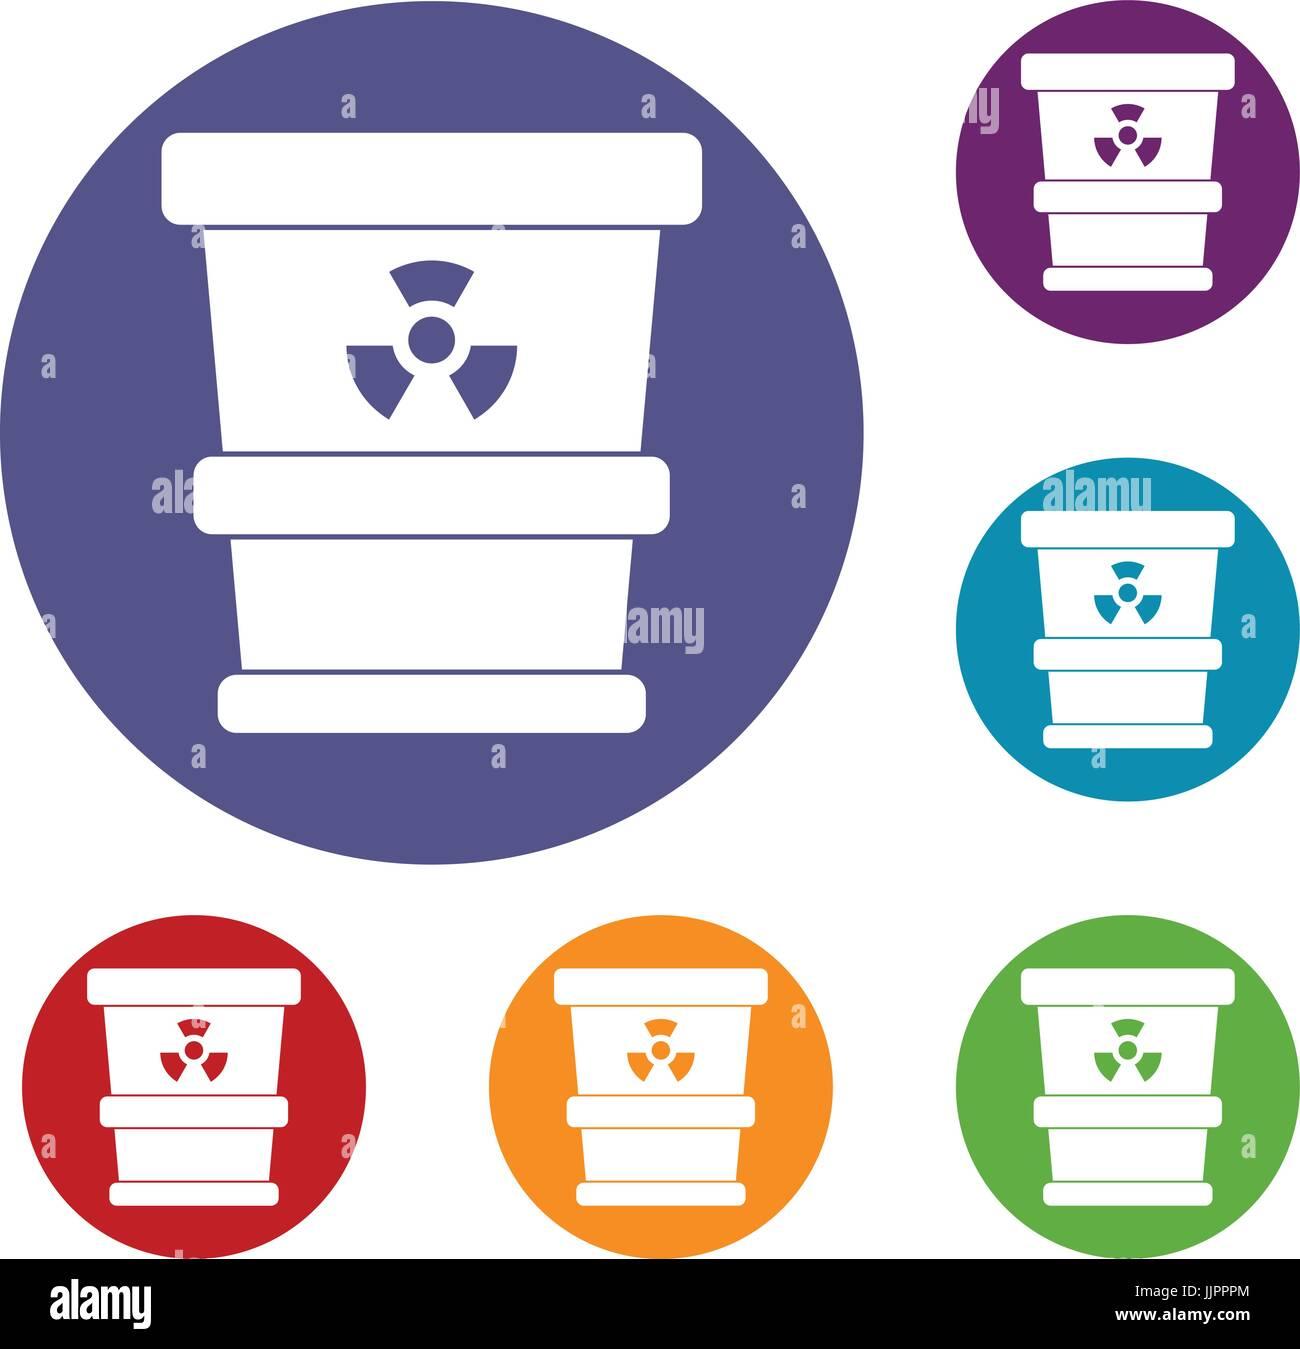 Trashcan Containing Radioactive Waste Icons Set Stock Photo Royalty